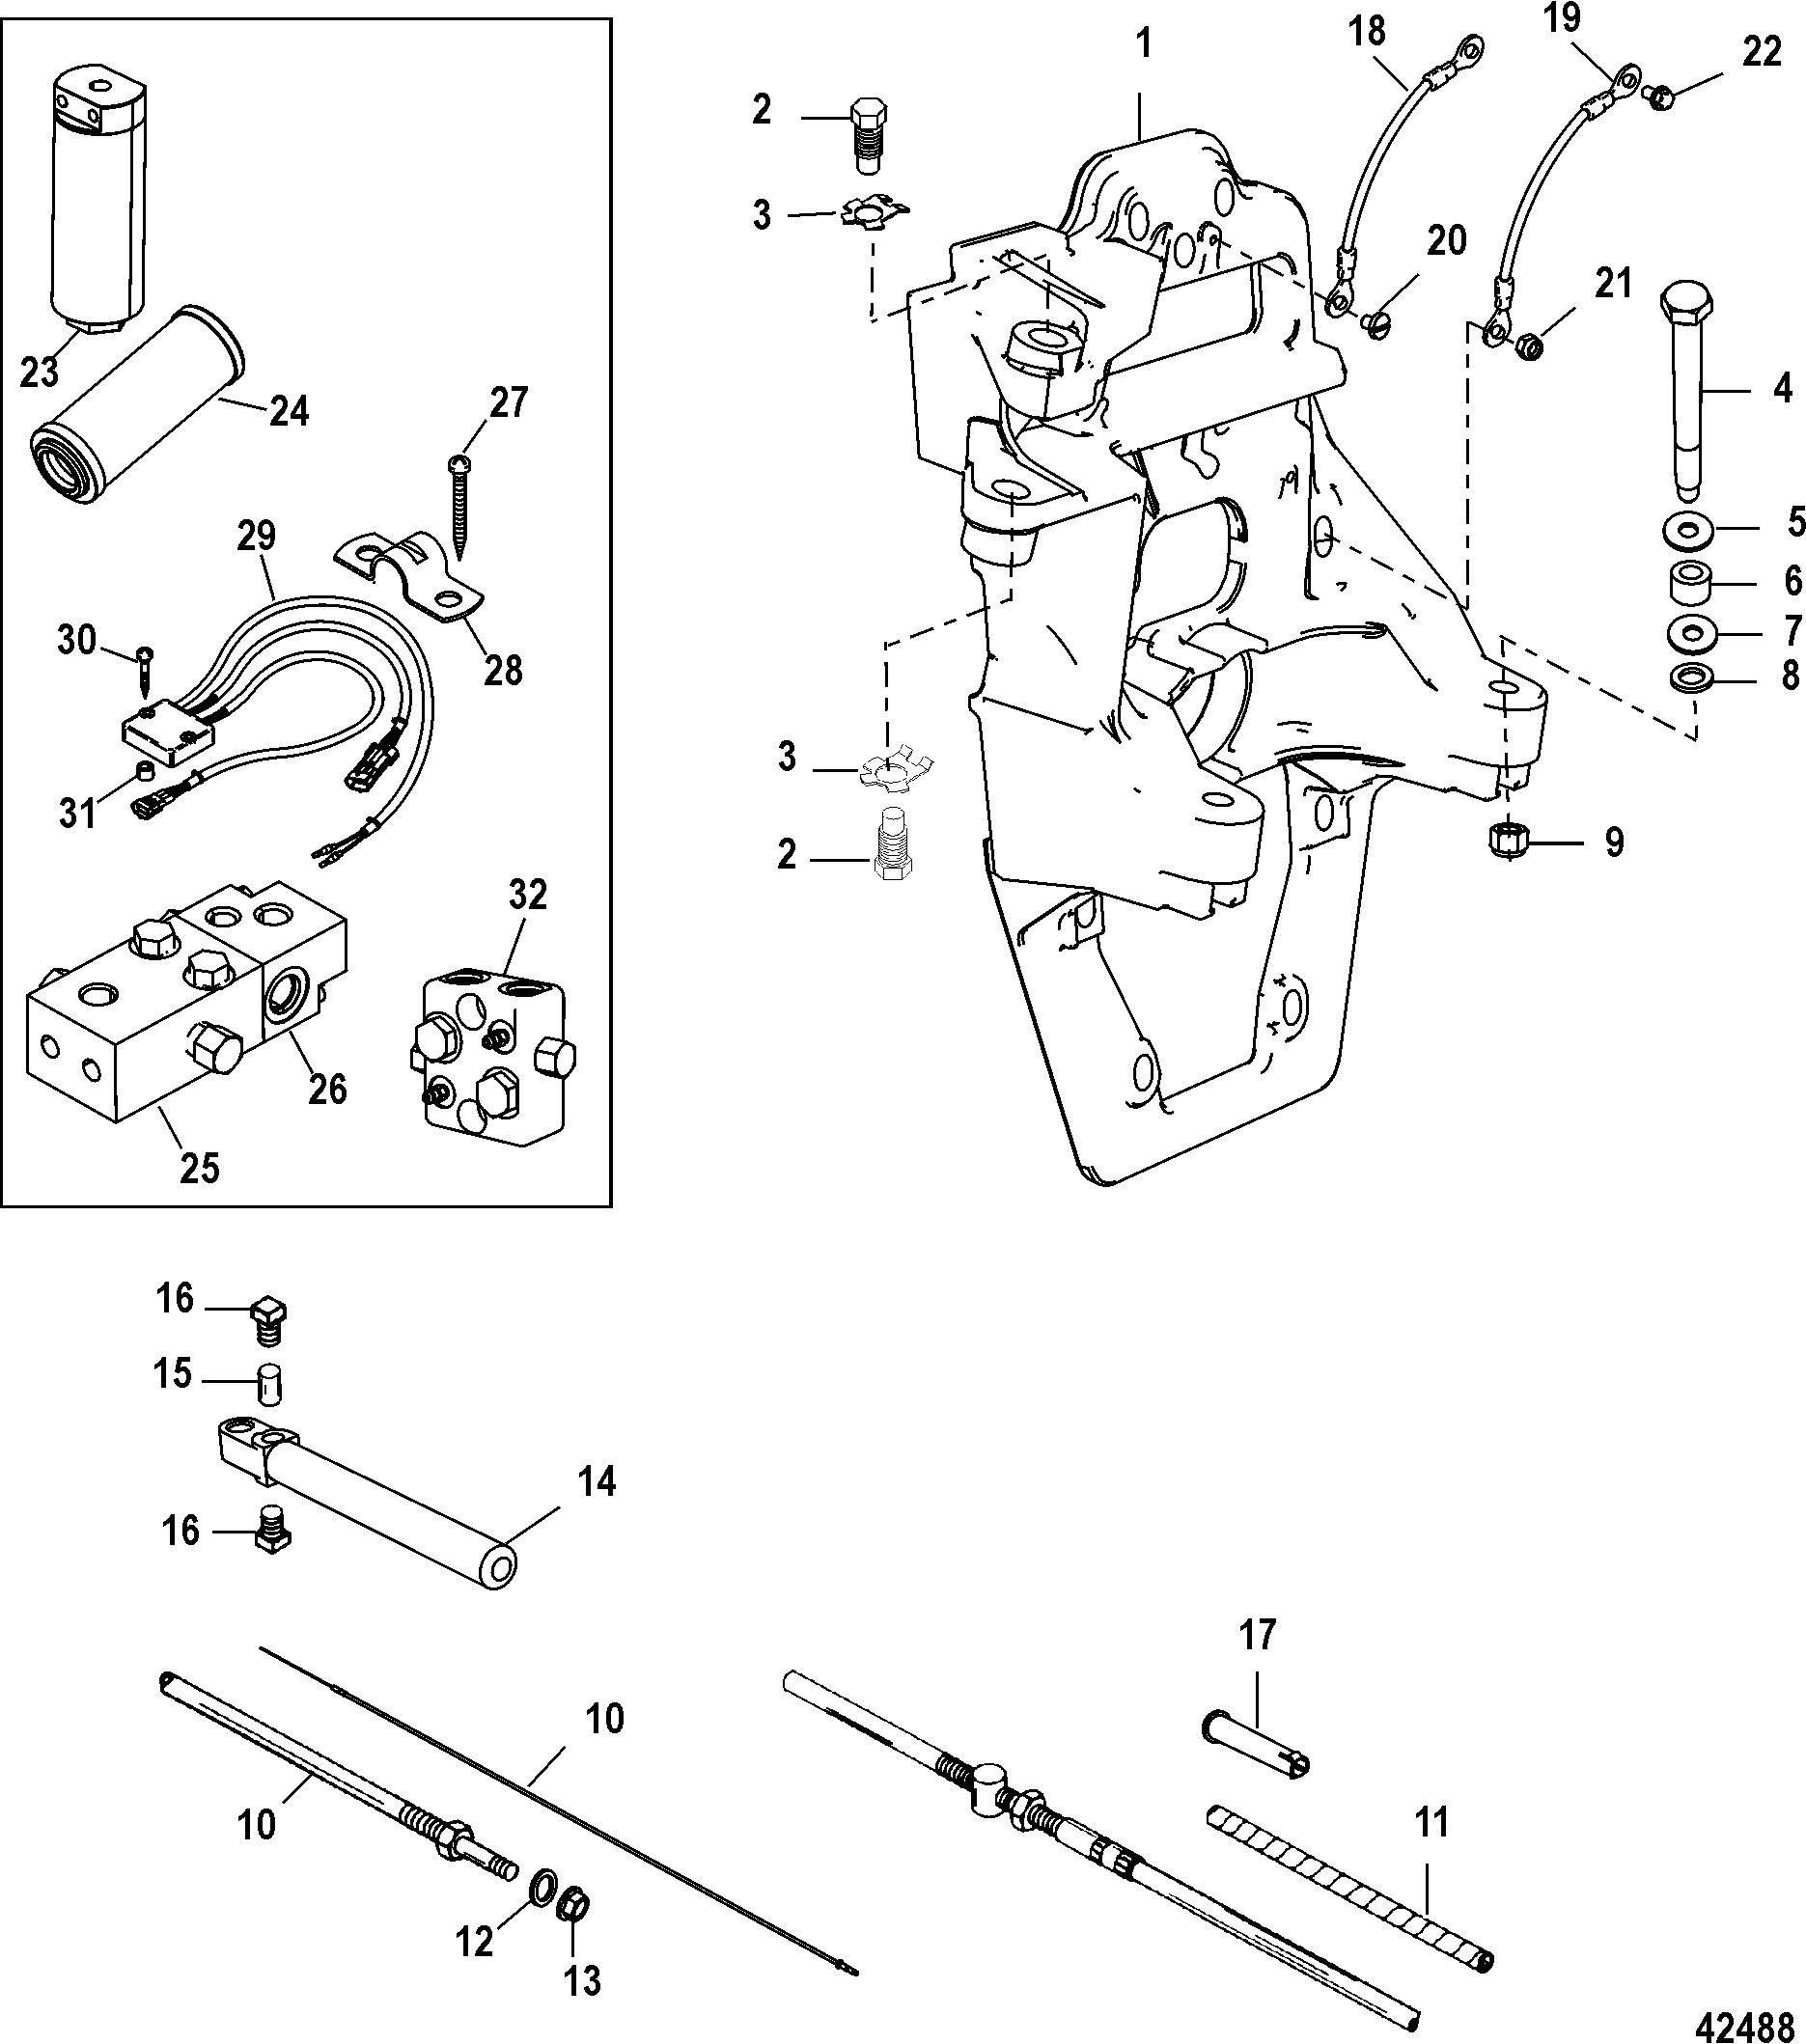 Mercruiser Alpha One Shift Cable Diagram Wiring Master Blogs For Stern Drive Transom Plate Data Schema Rh 43 Danielmeidl De Adjustment Outdrive